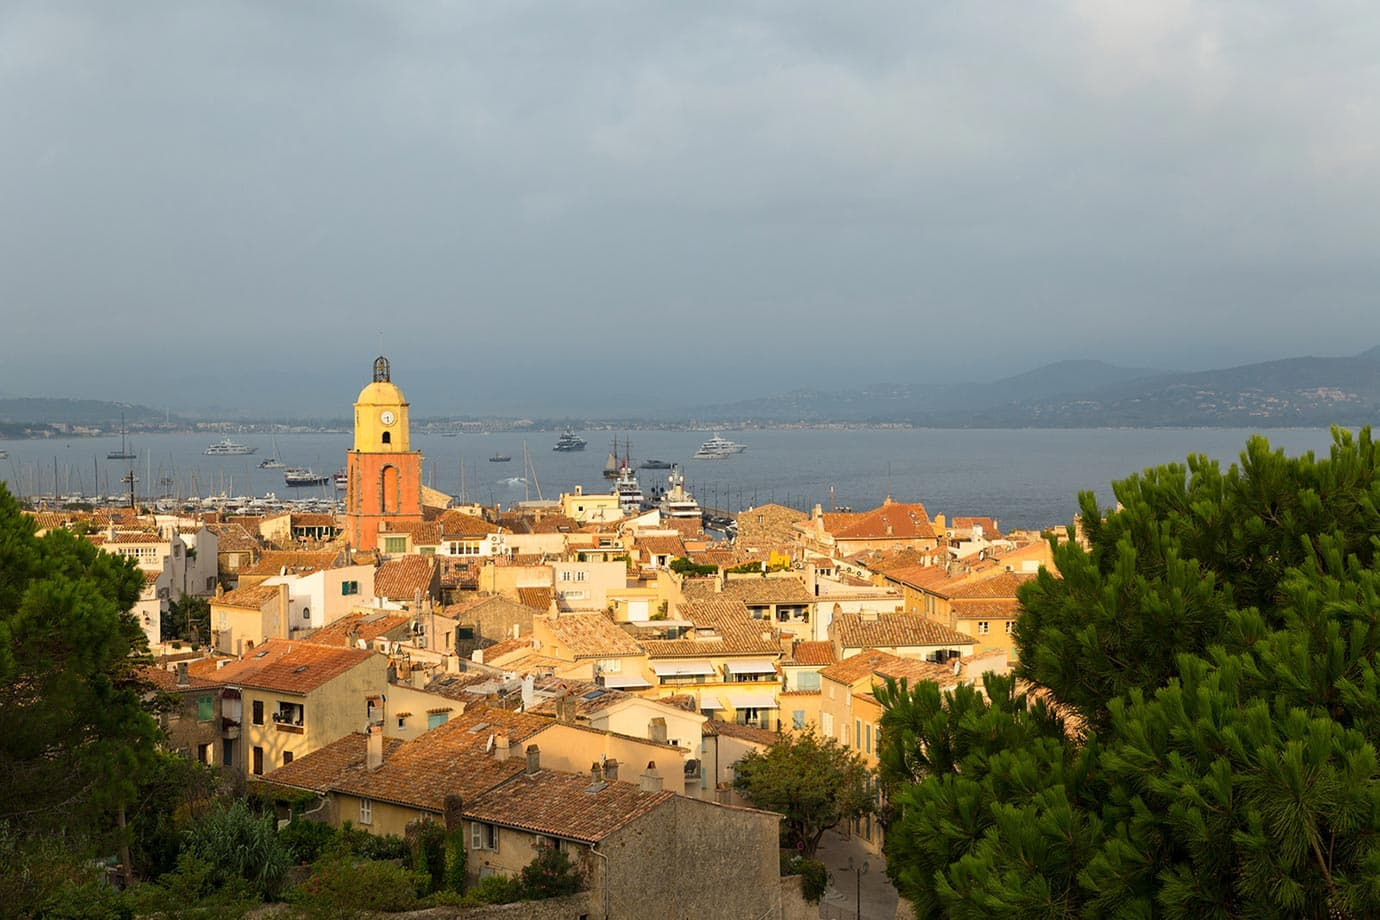 Views of St-Tropez